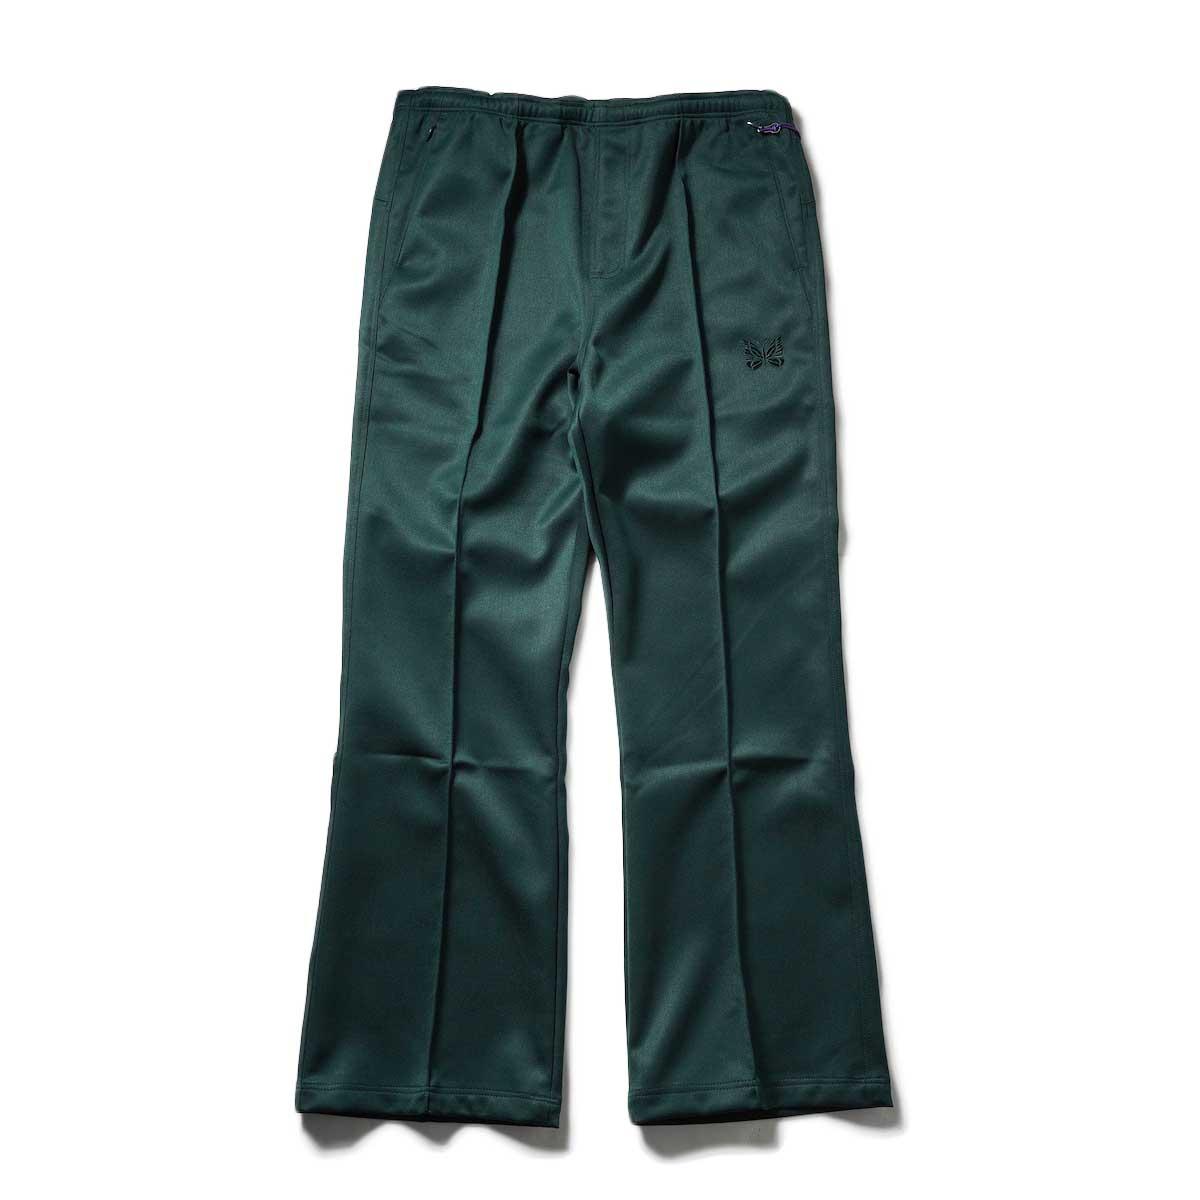 Needles / W.U. BOOT-CUT PANT - PE/R DOESKIN (Green)正面